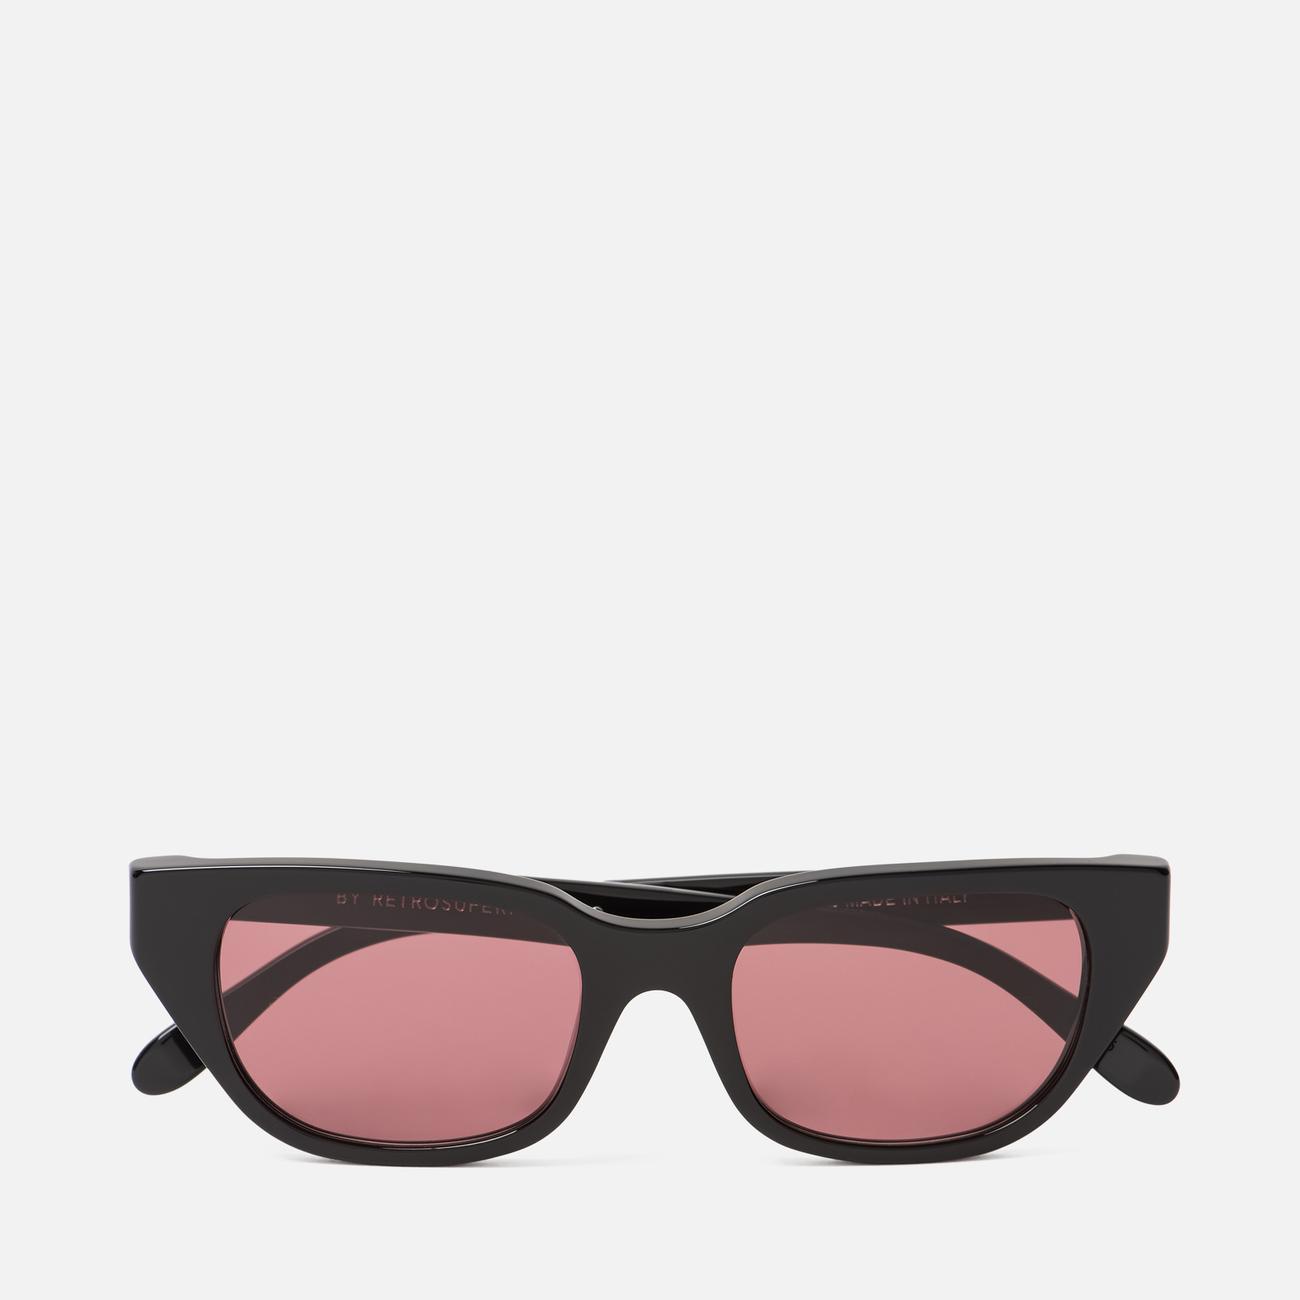 Солнцезащитные очки RETROSUPERFUTURE Cento 51 Bordeaux